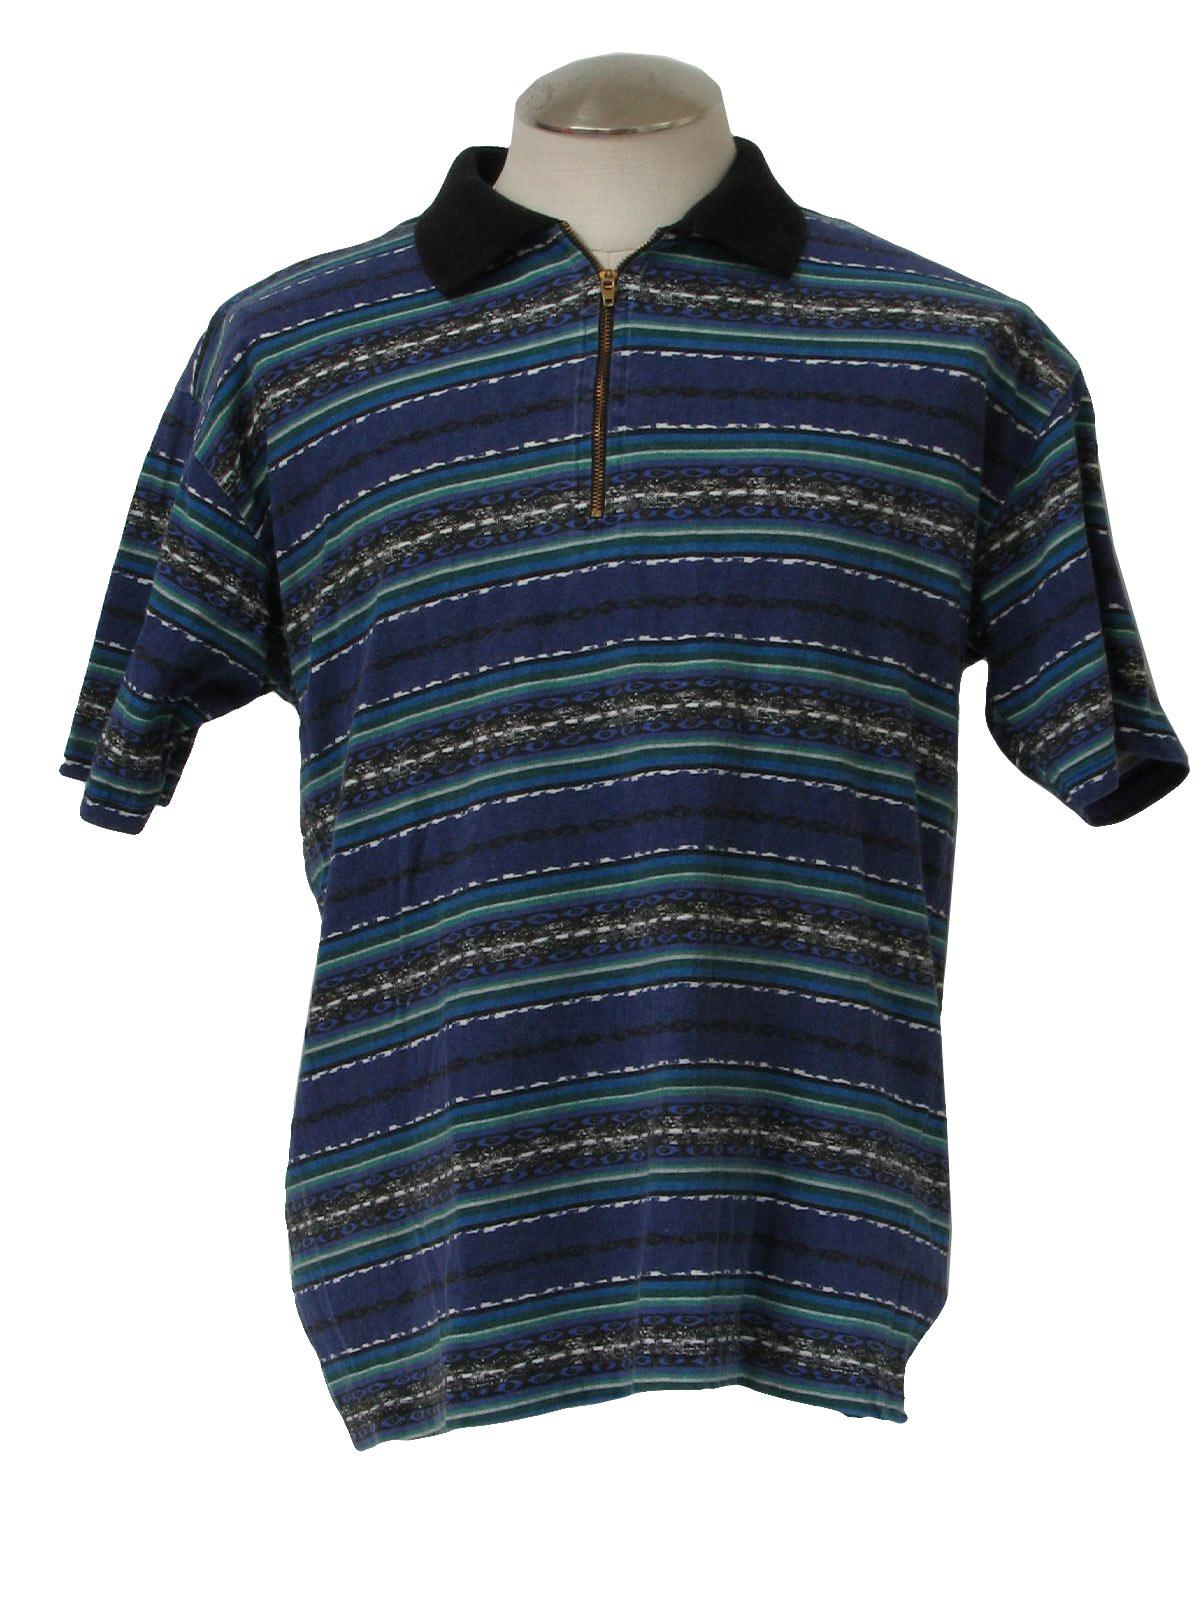 1990s polo shirts